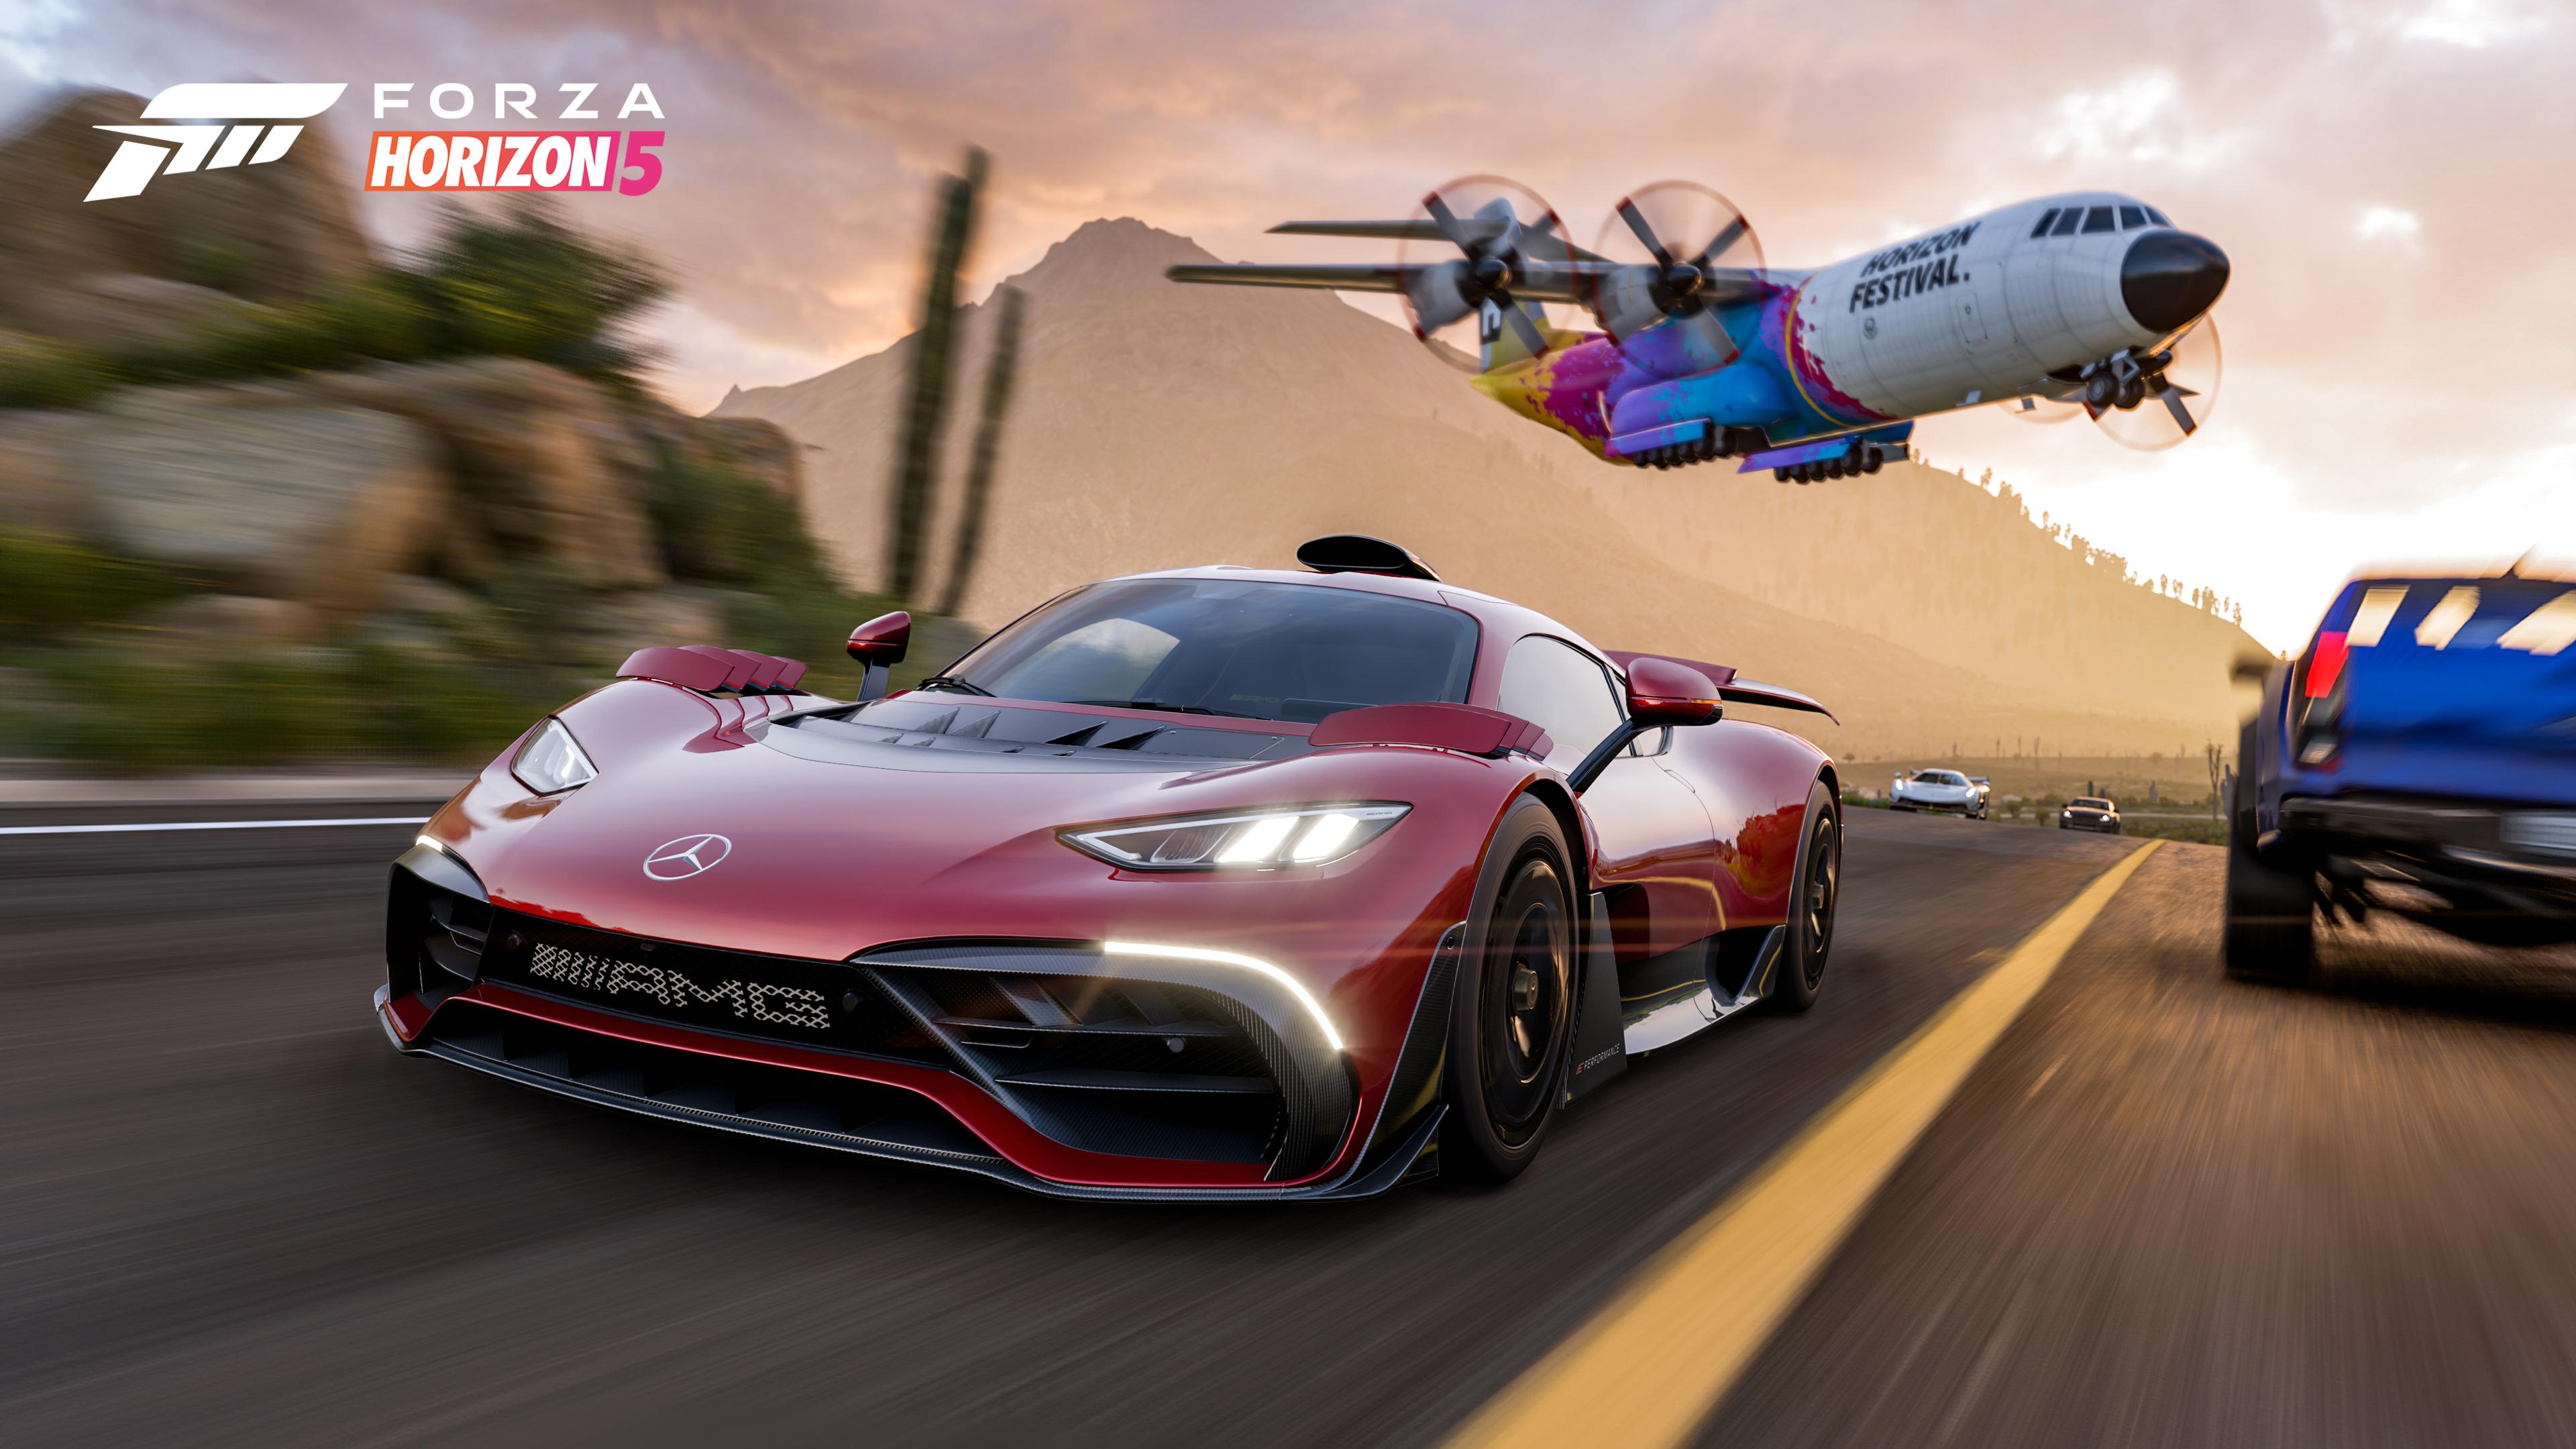 Forza-Horizon5-Launch-Preview-04-16x9-WM